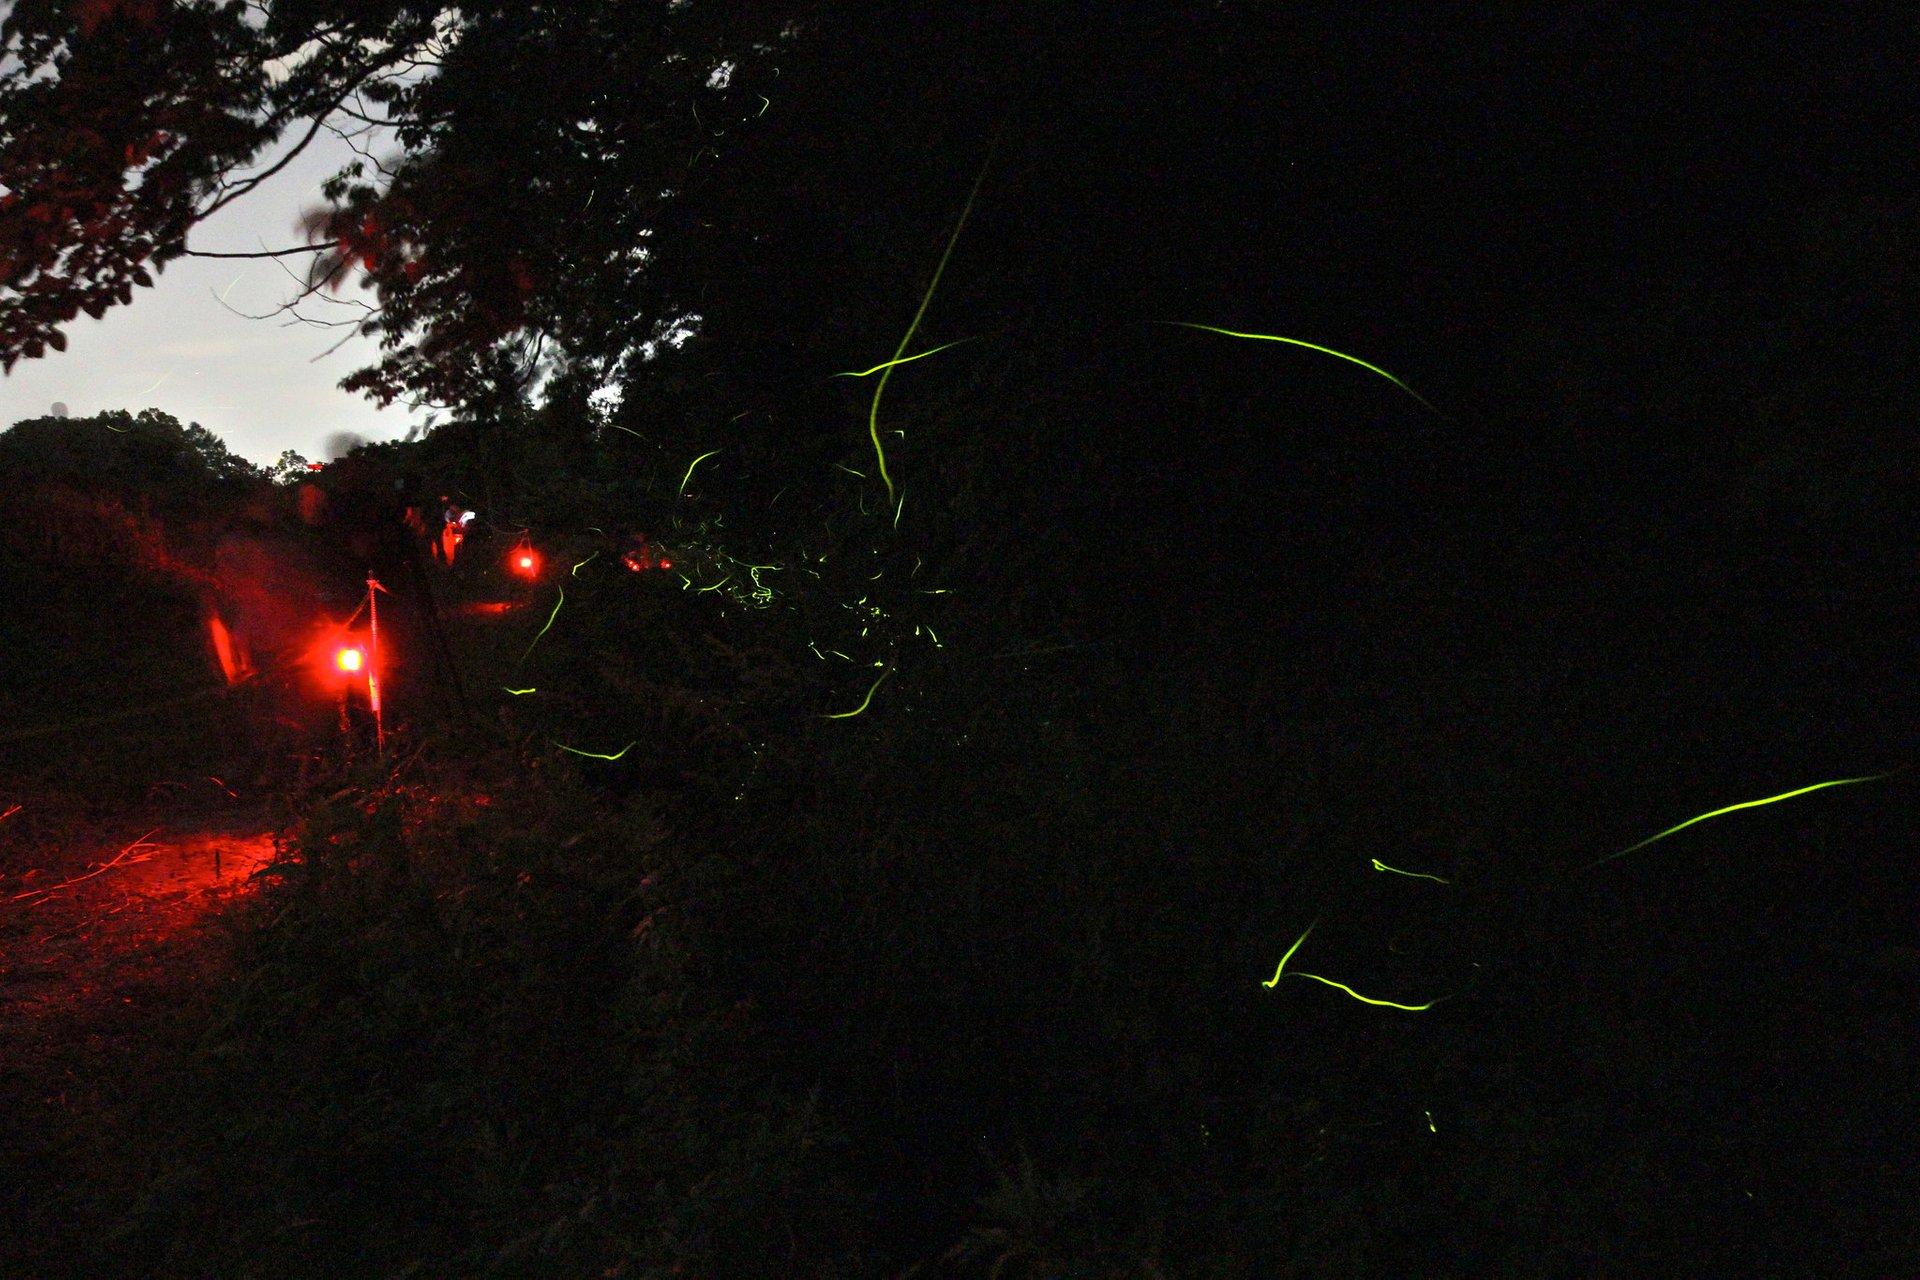 Best time for Firefly Festivals (Hotaru Matsuri) in Japan 2020